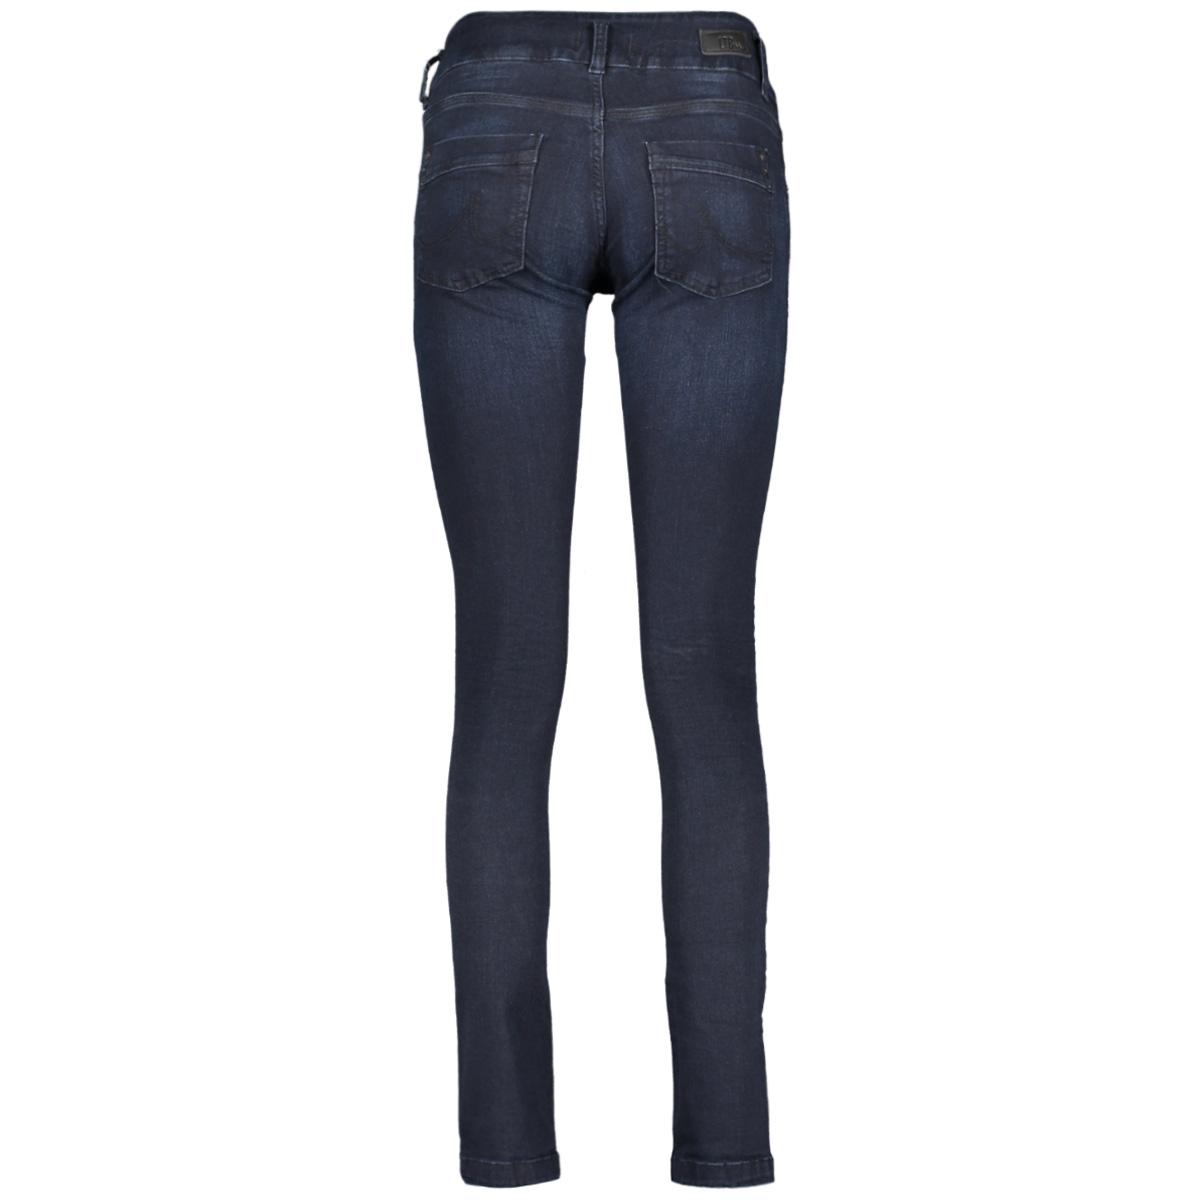 zena 1009 50618 14625 ltb jeans 51890